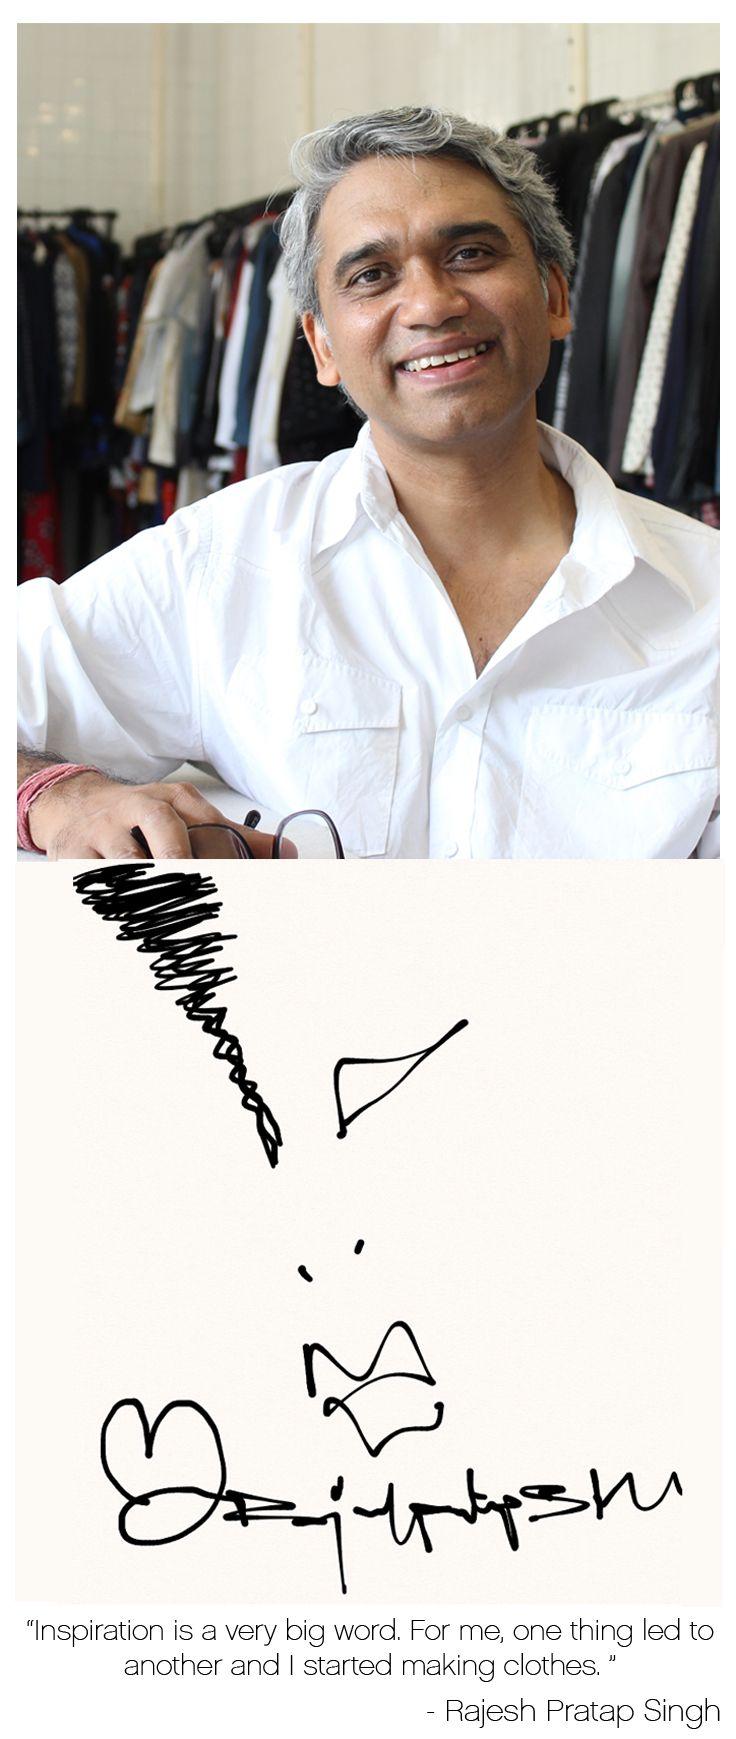 Play around with the power of minimalism advises Rajesh Pratap Singh. https://www.youtube.com/watch?v=T60ie9DtIW0&list=PLNje6YNvJq0tXvQoHmVHy6QhGYBTL3HZk&index=11